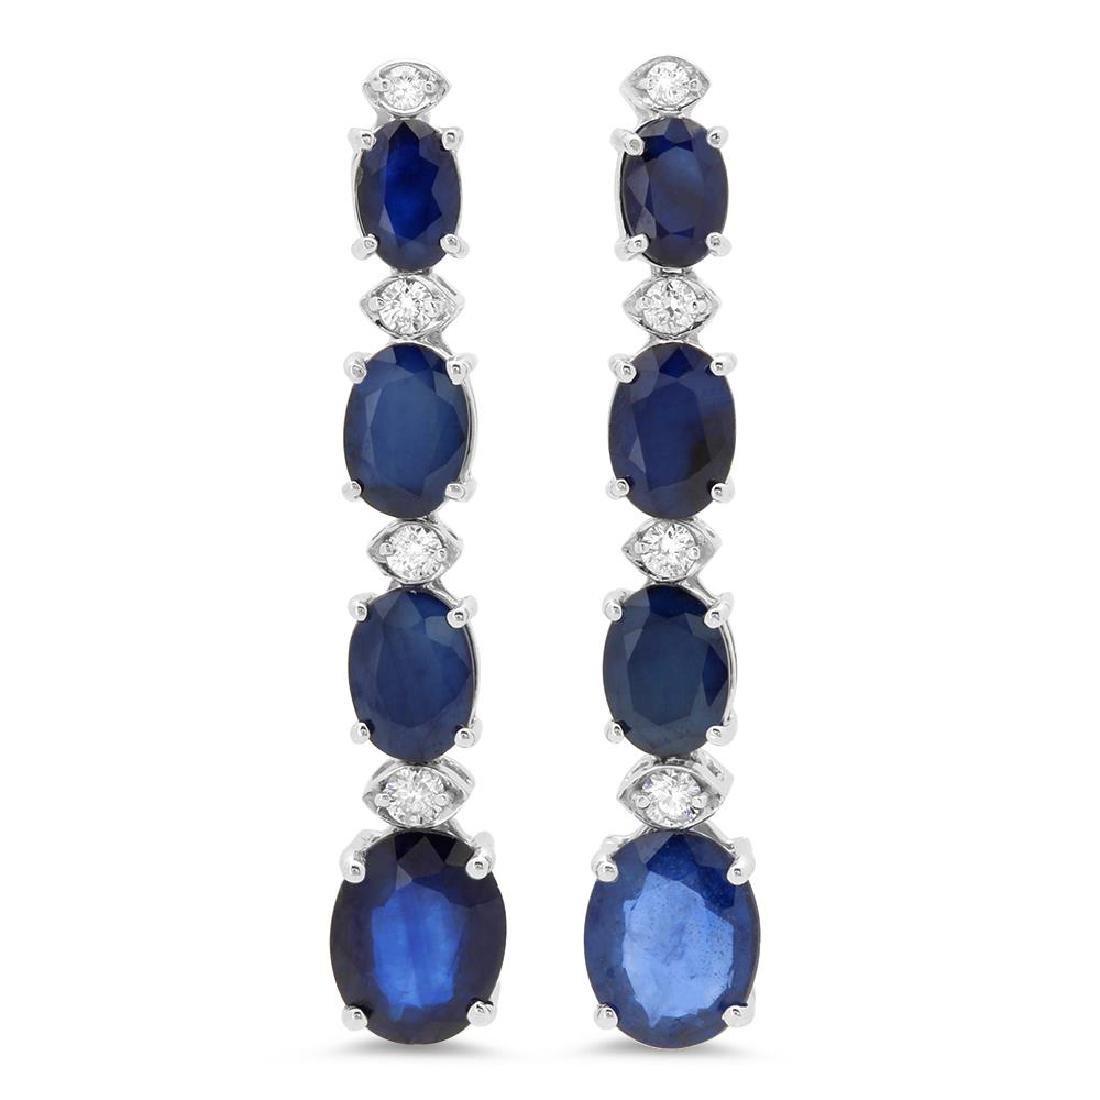 14K Gold 9.00ct Sapphire 0.36cts Diamond Earrings